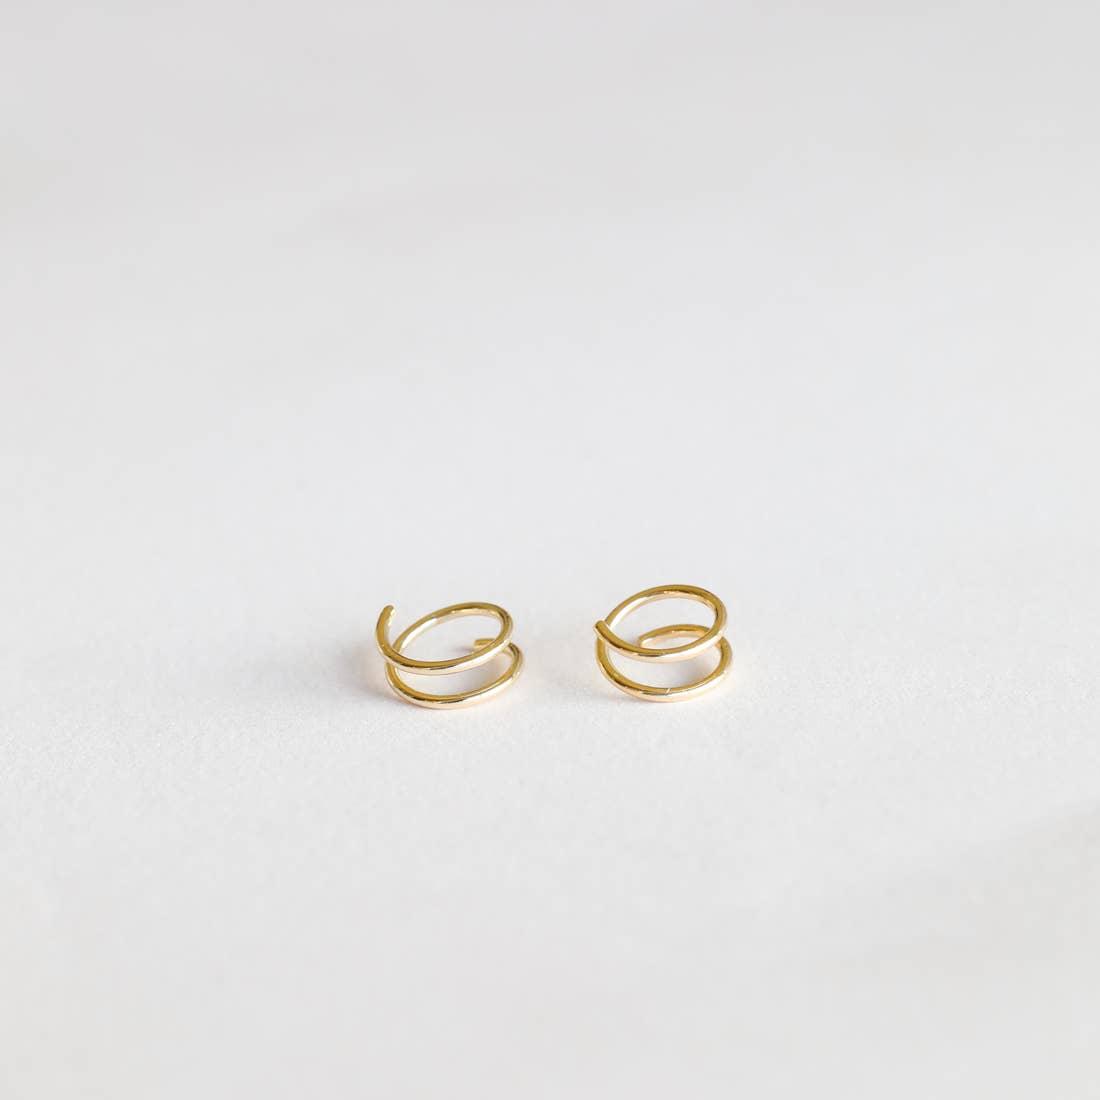 Image of Jax Kelly-Minimalist Spiral Earrings